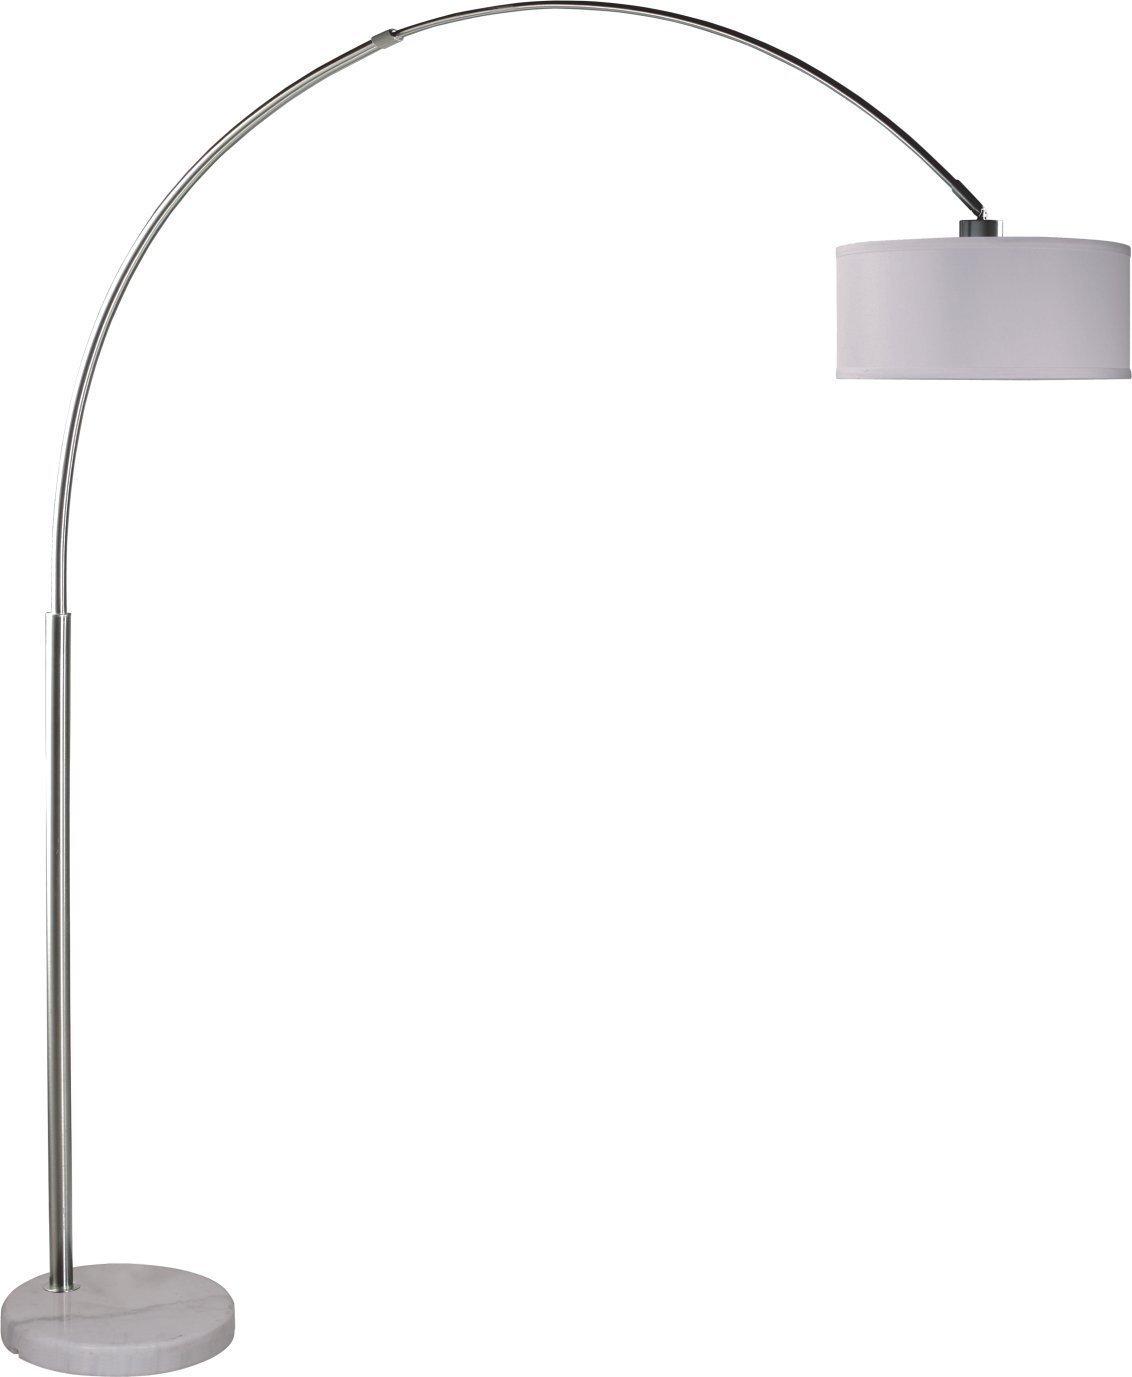 SH Lighting Steel Adjustable Arching Floor Lamp 81'' H (6938WH-LED)